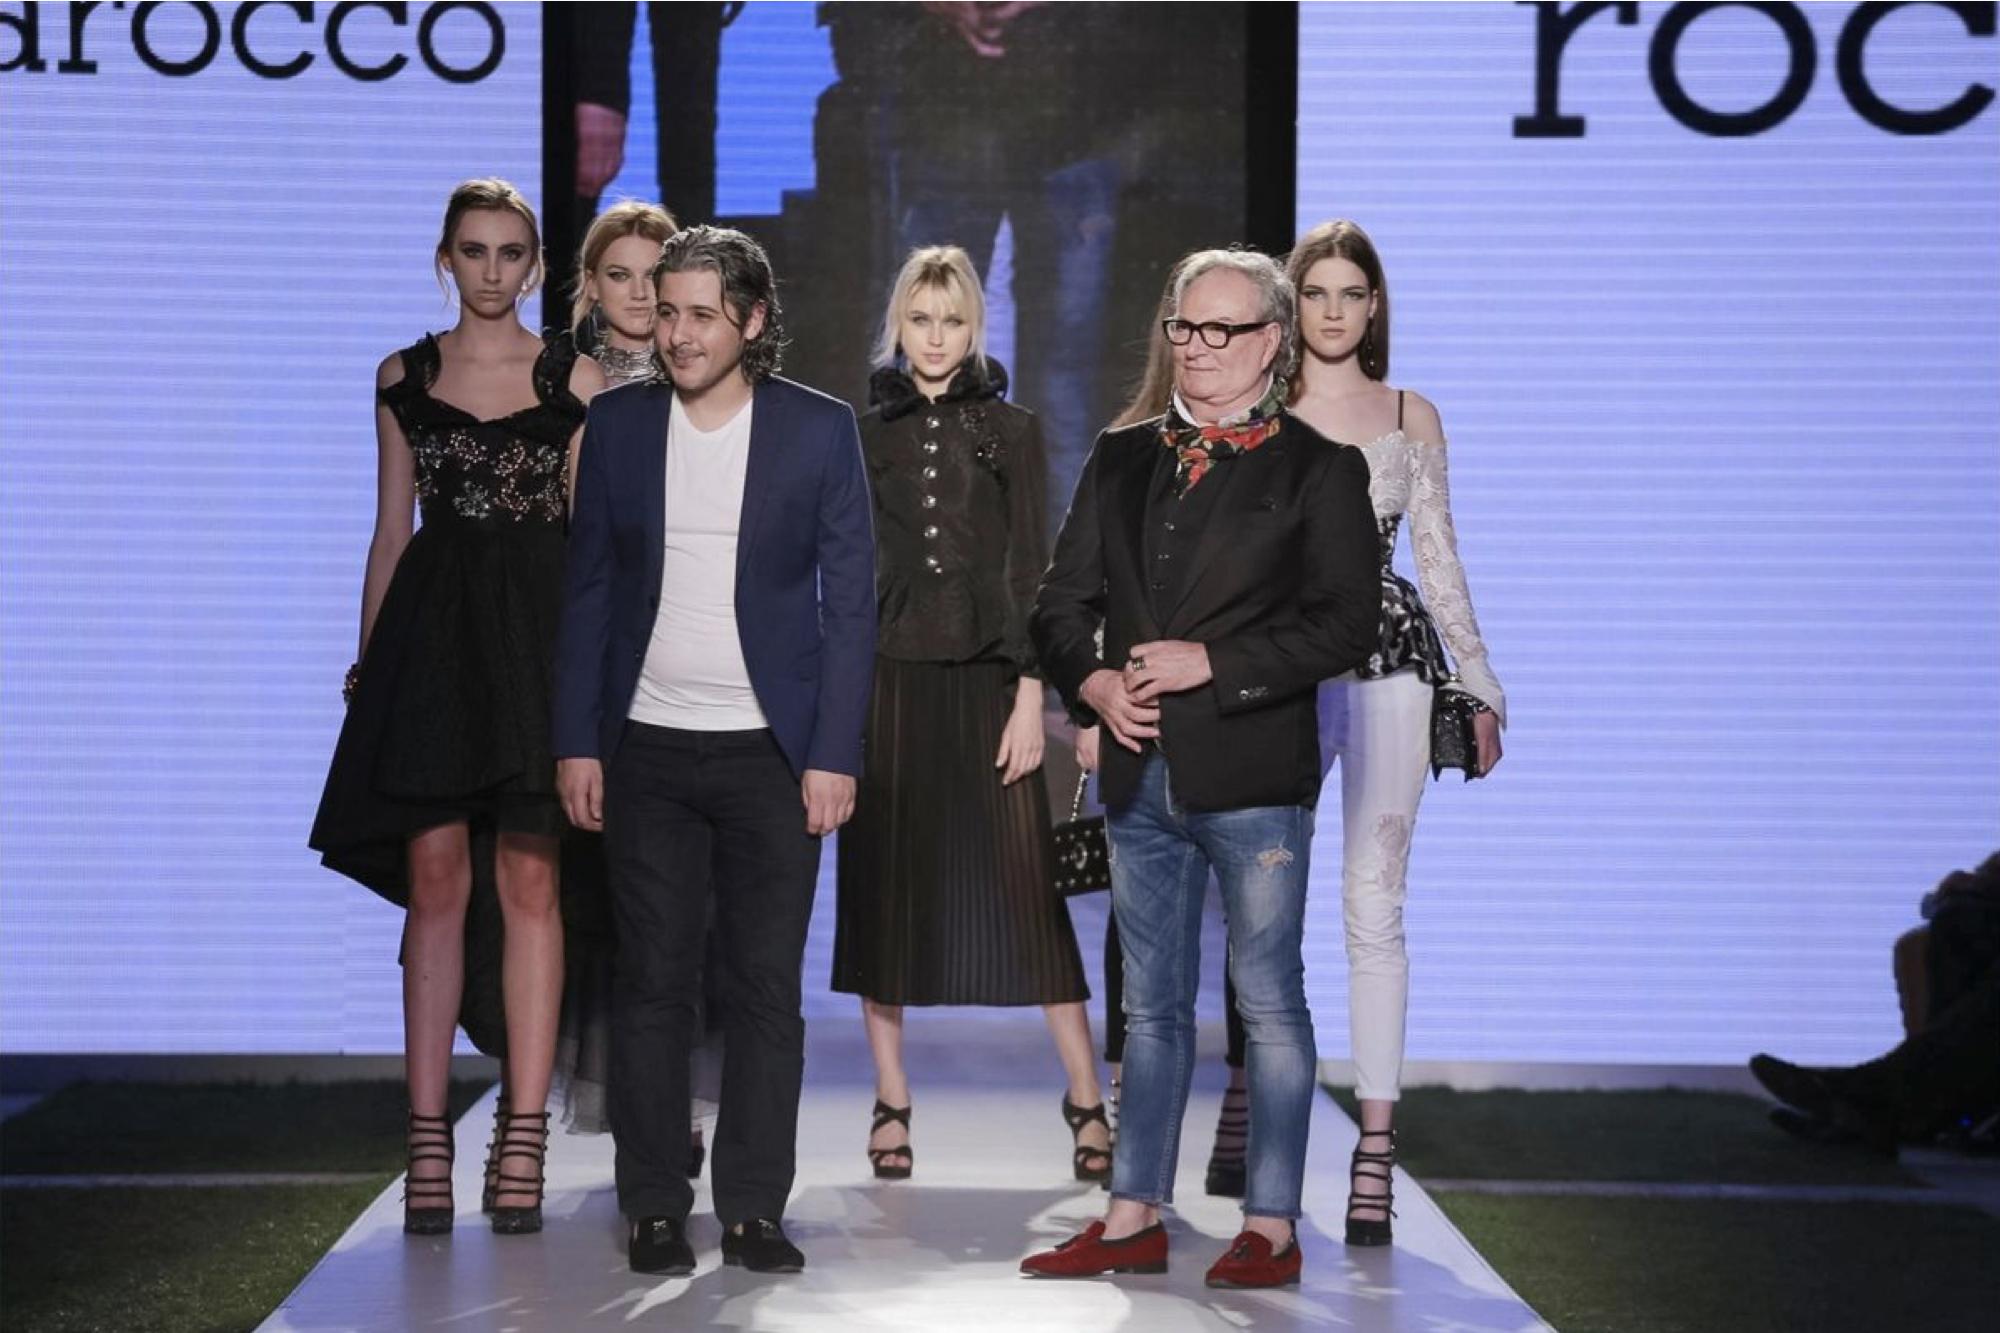 Roccobarocco-RTW-FW16-Dubai-9402-145832397